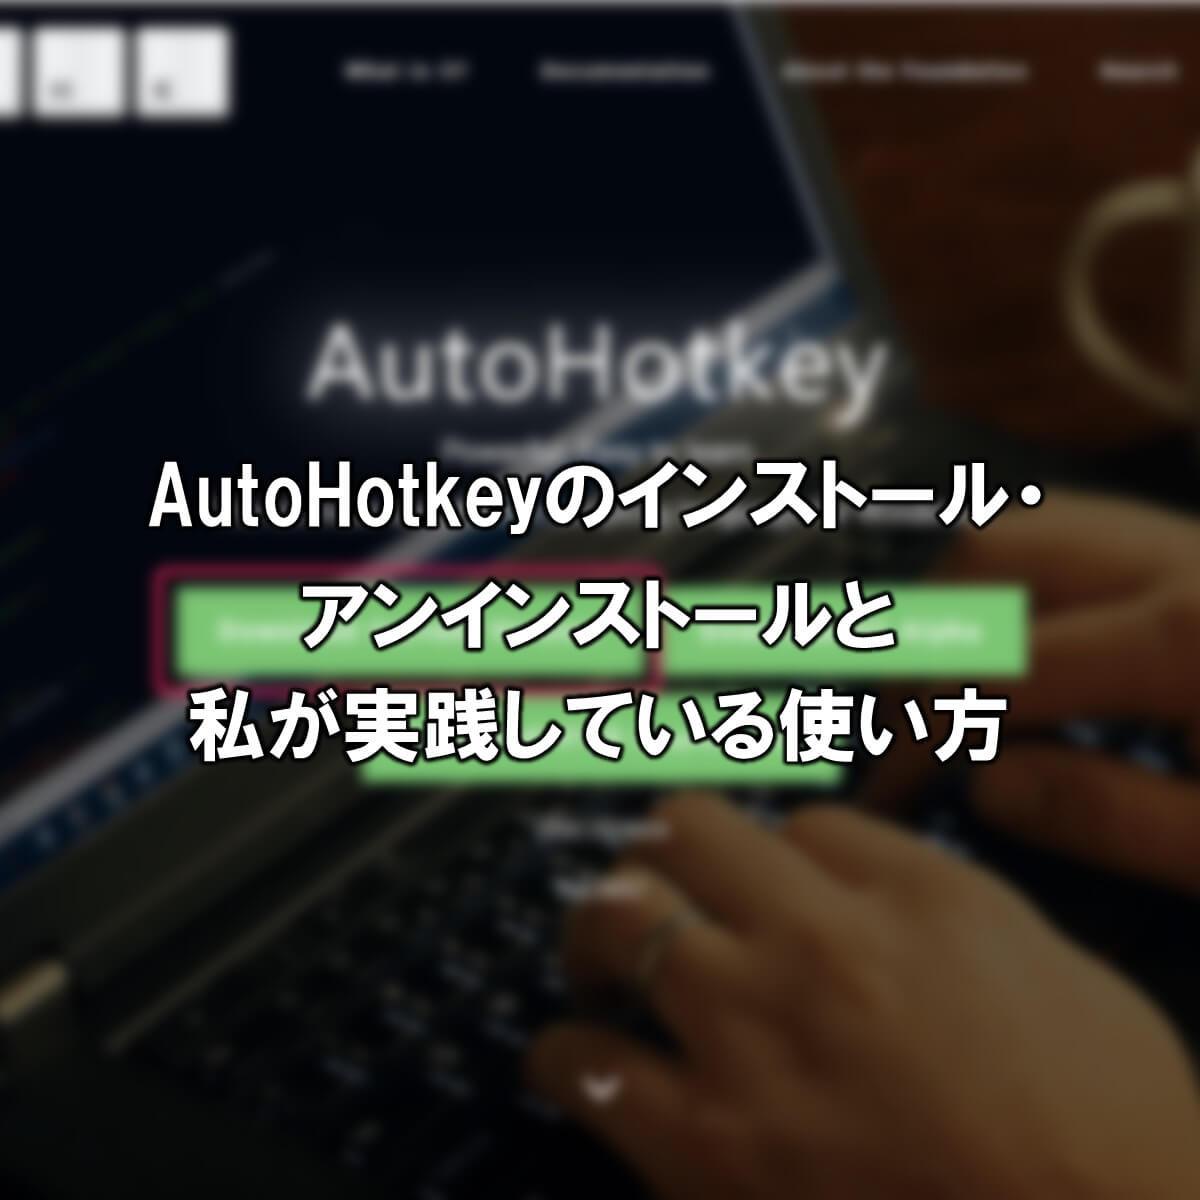 AutoHotkeyのインストール・アンインストールと私が実践している使い方